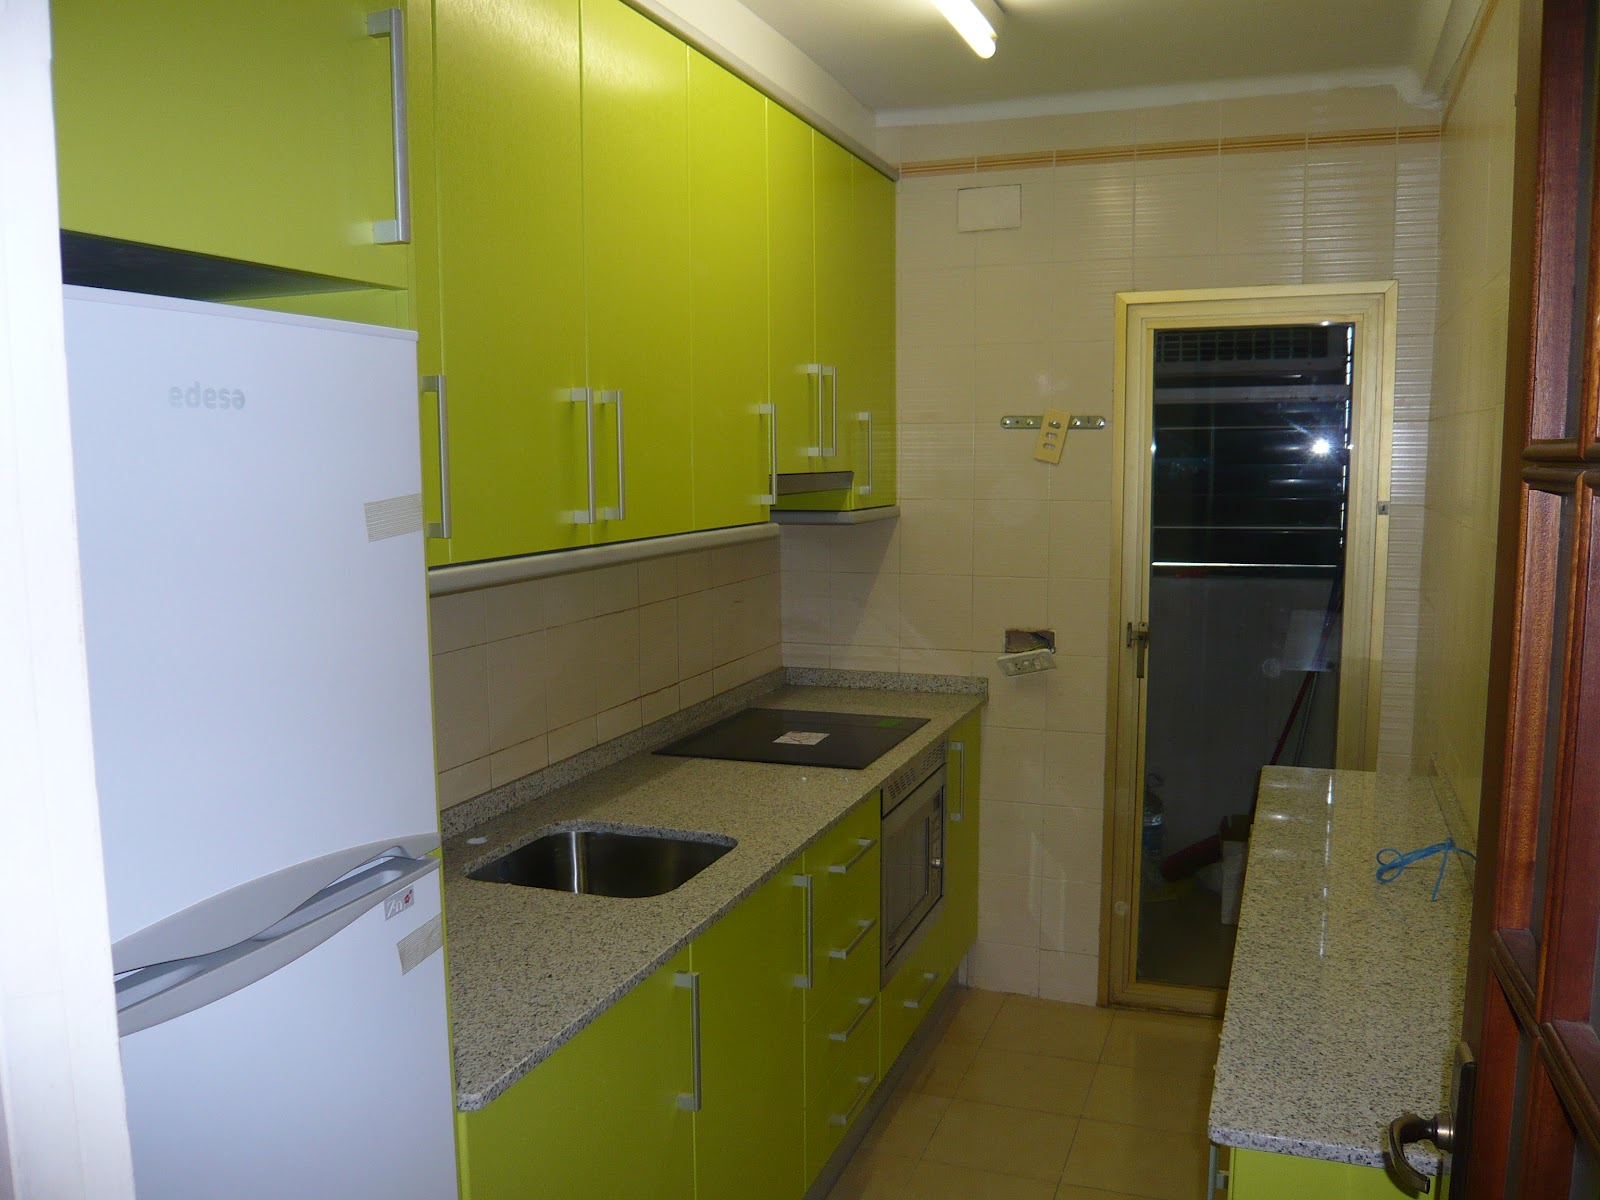 Reuscuina muebles de cocina en formica verde pistacho for Cocina verde pistacho